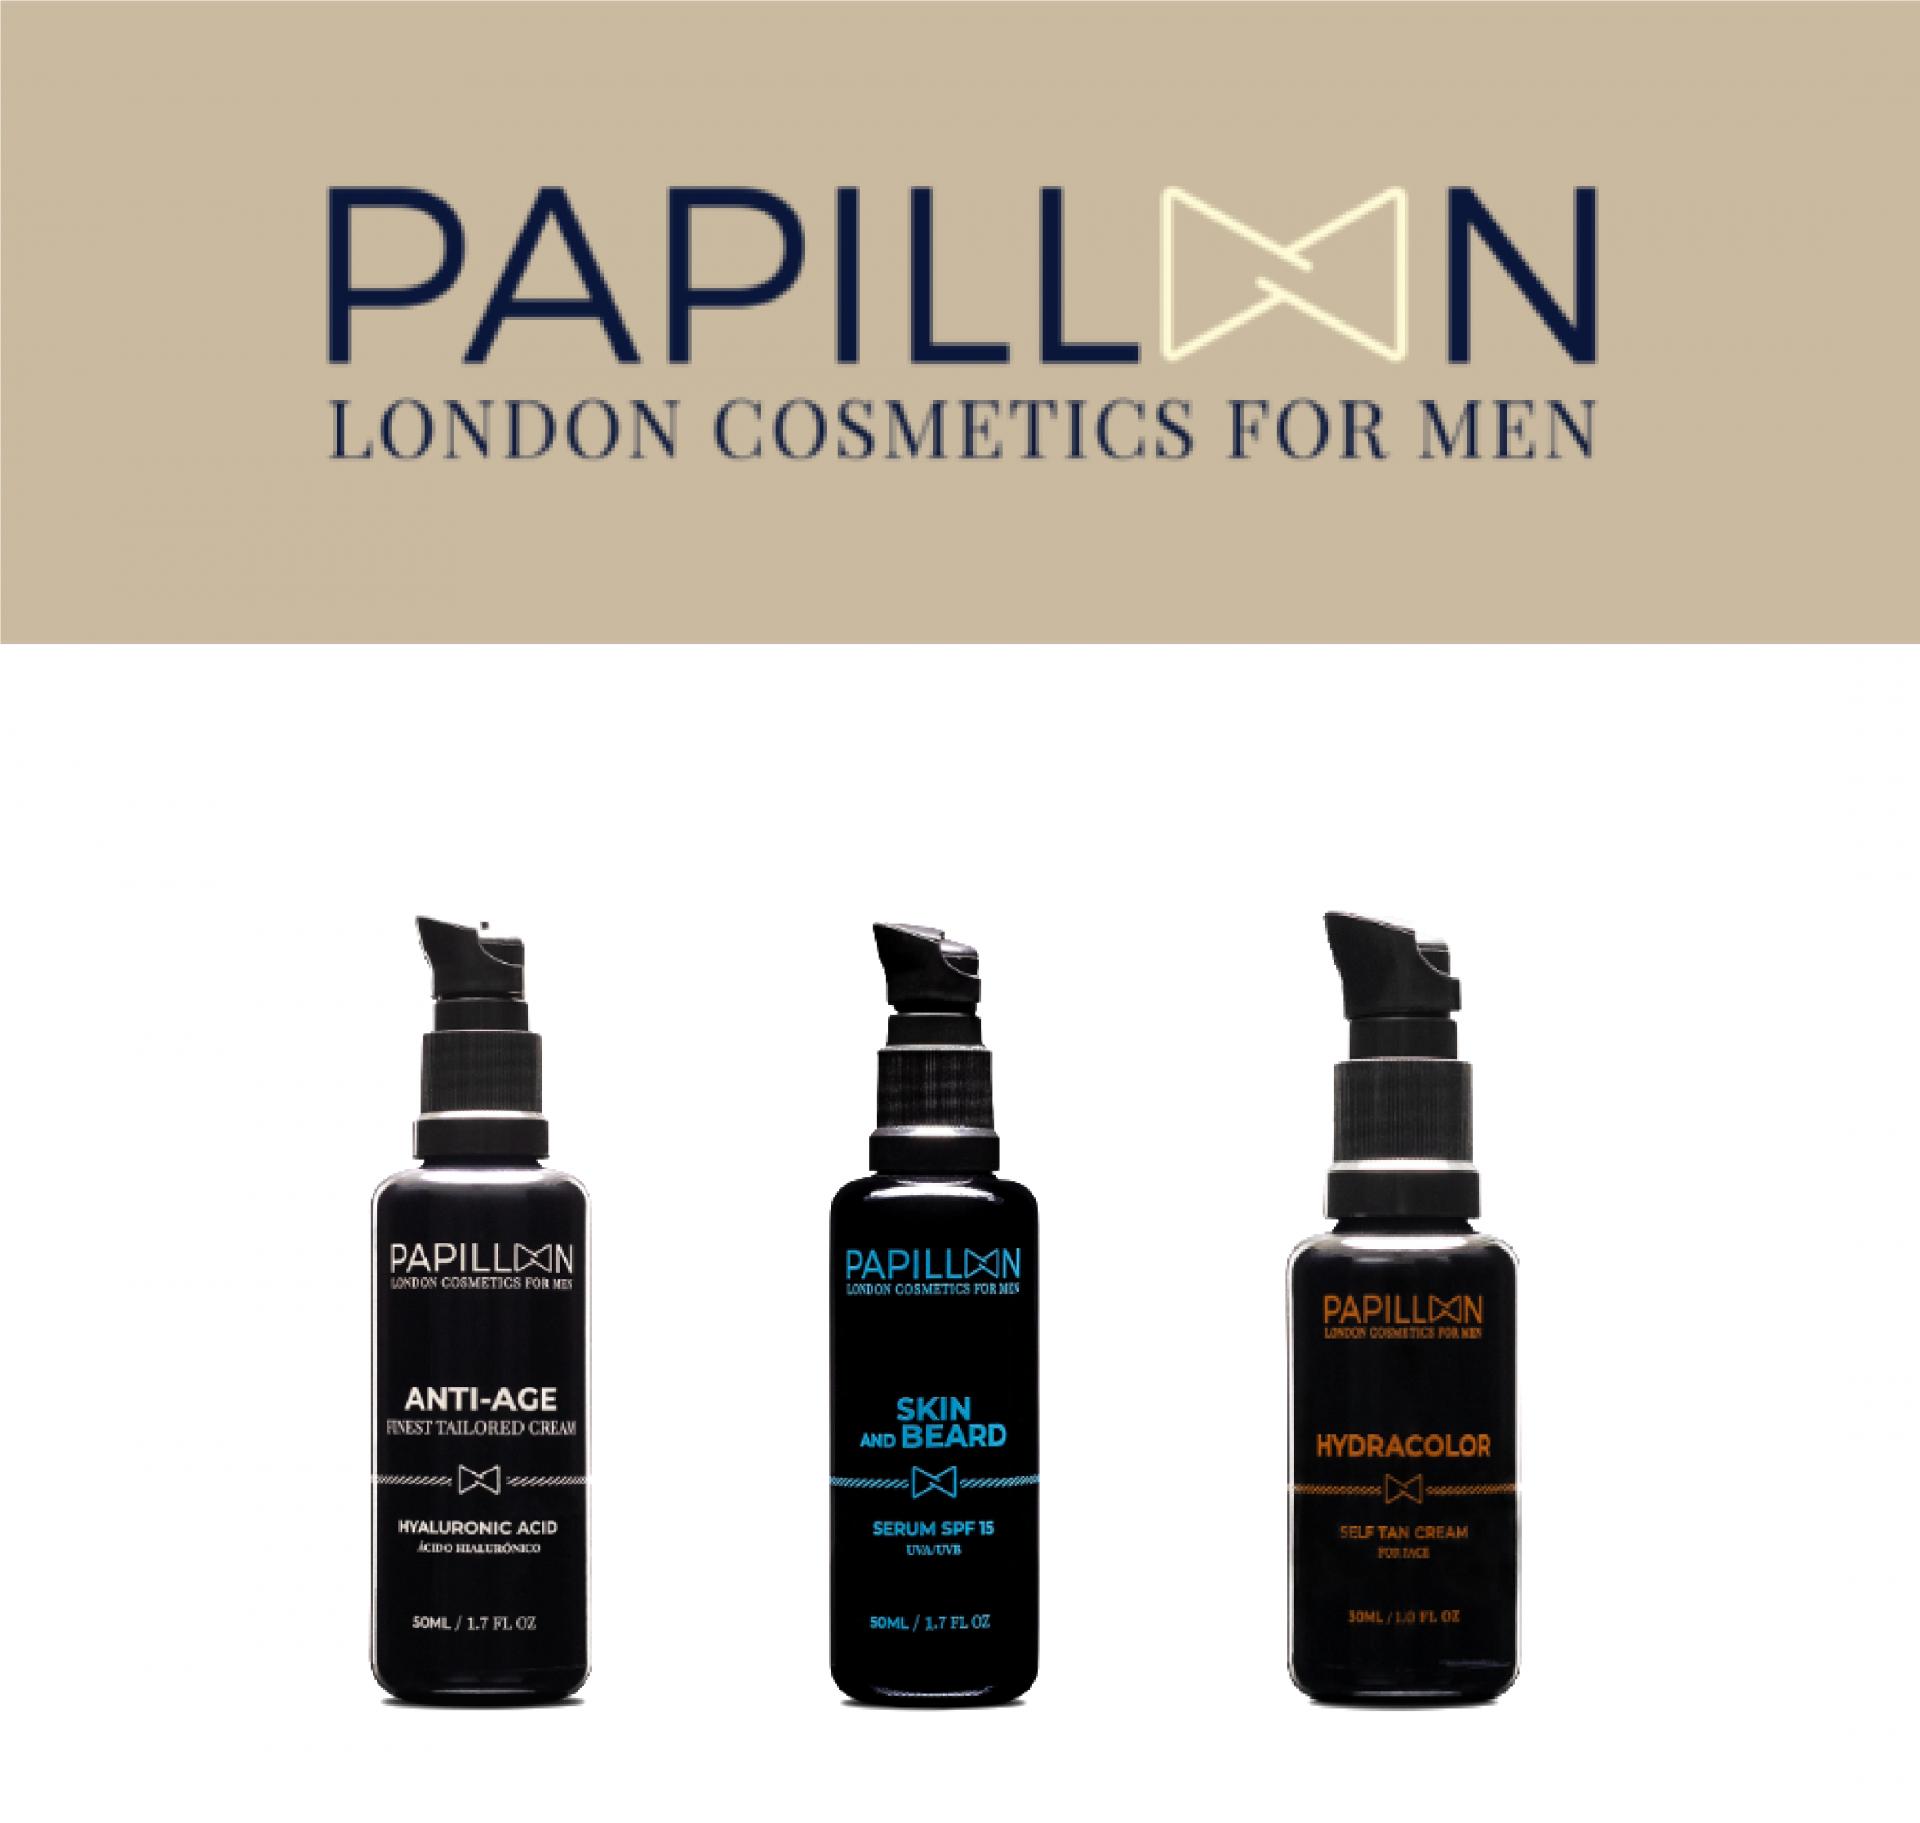 Papillon | Anti Age Tailored Cream + Skin and Beard + Hydracolor